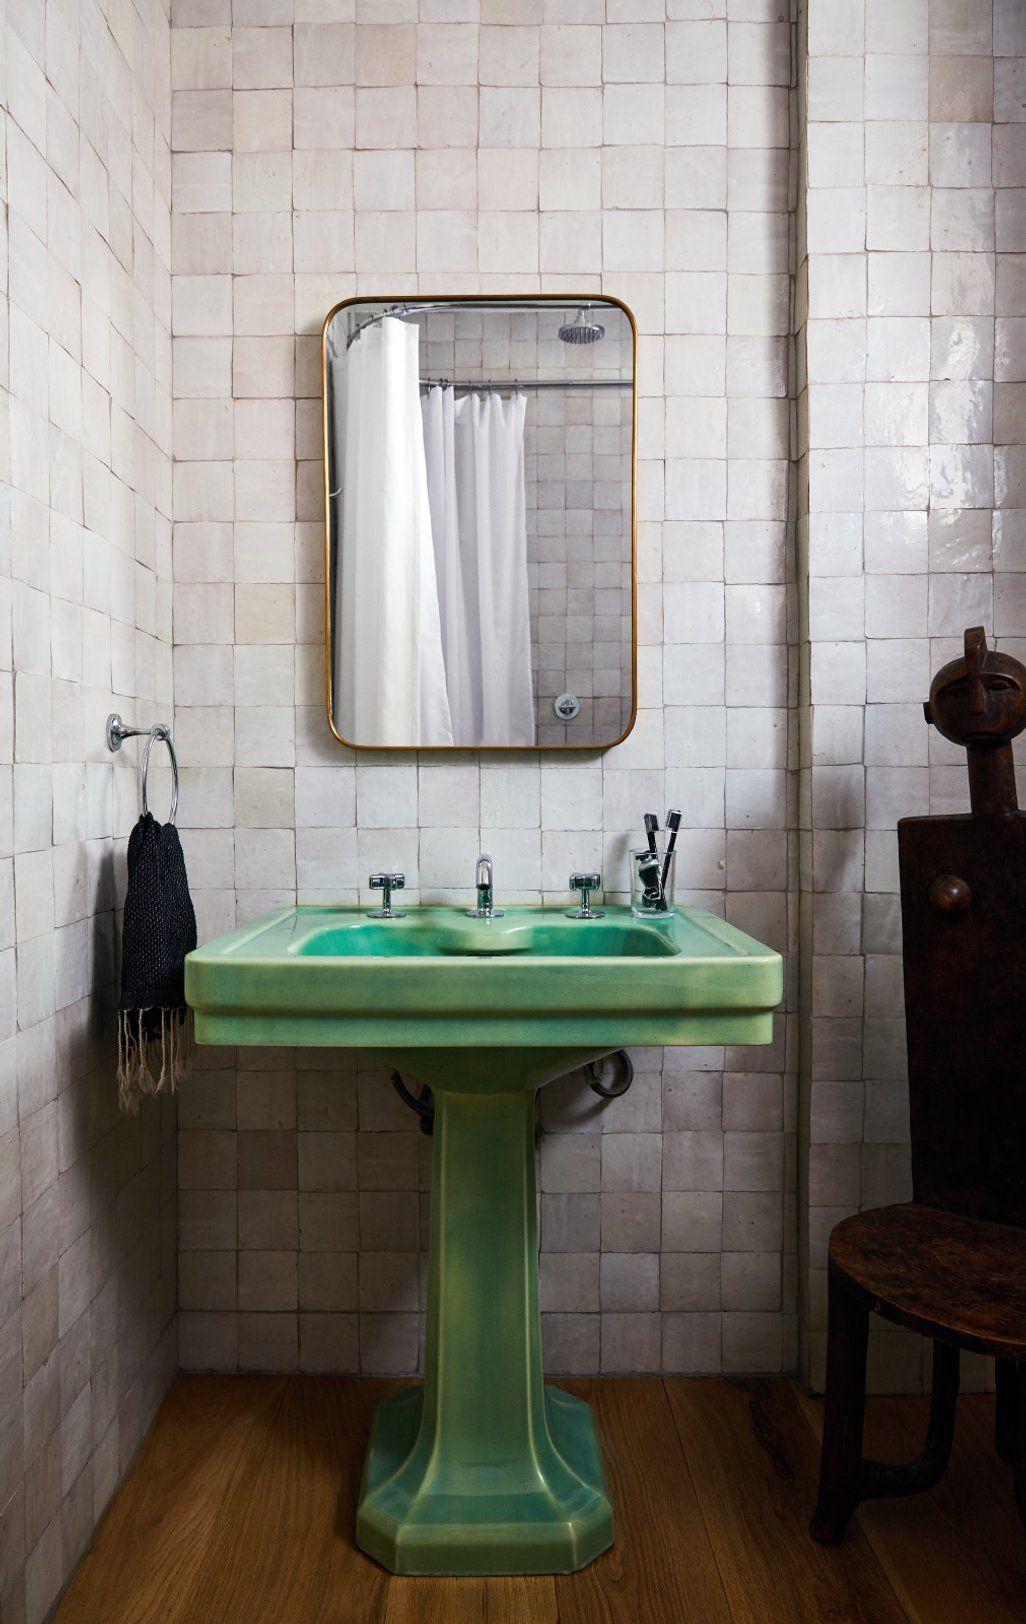 Bathroom by ASH NYC on 1stdibs#1stdibs #ash #bathroom #nyc